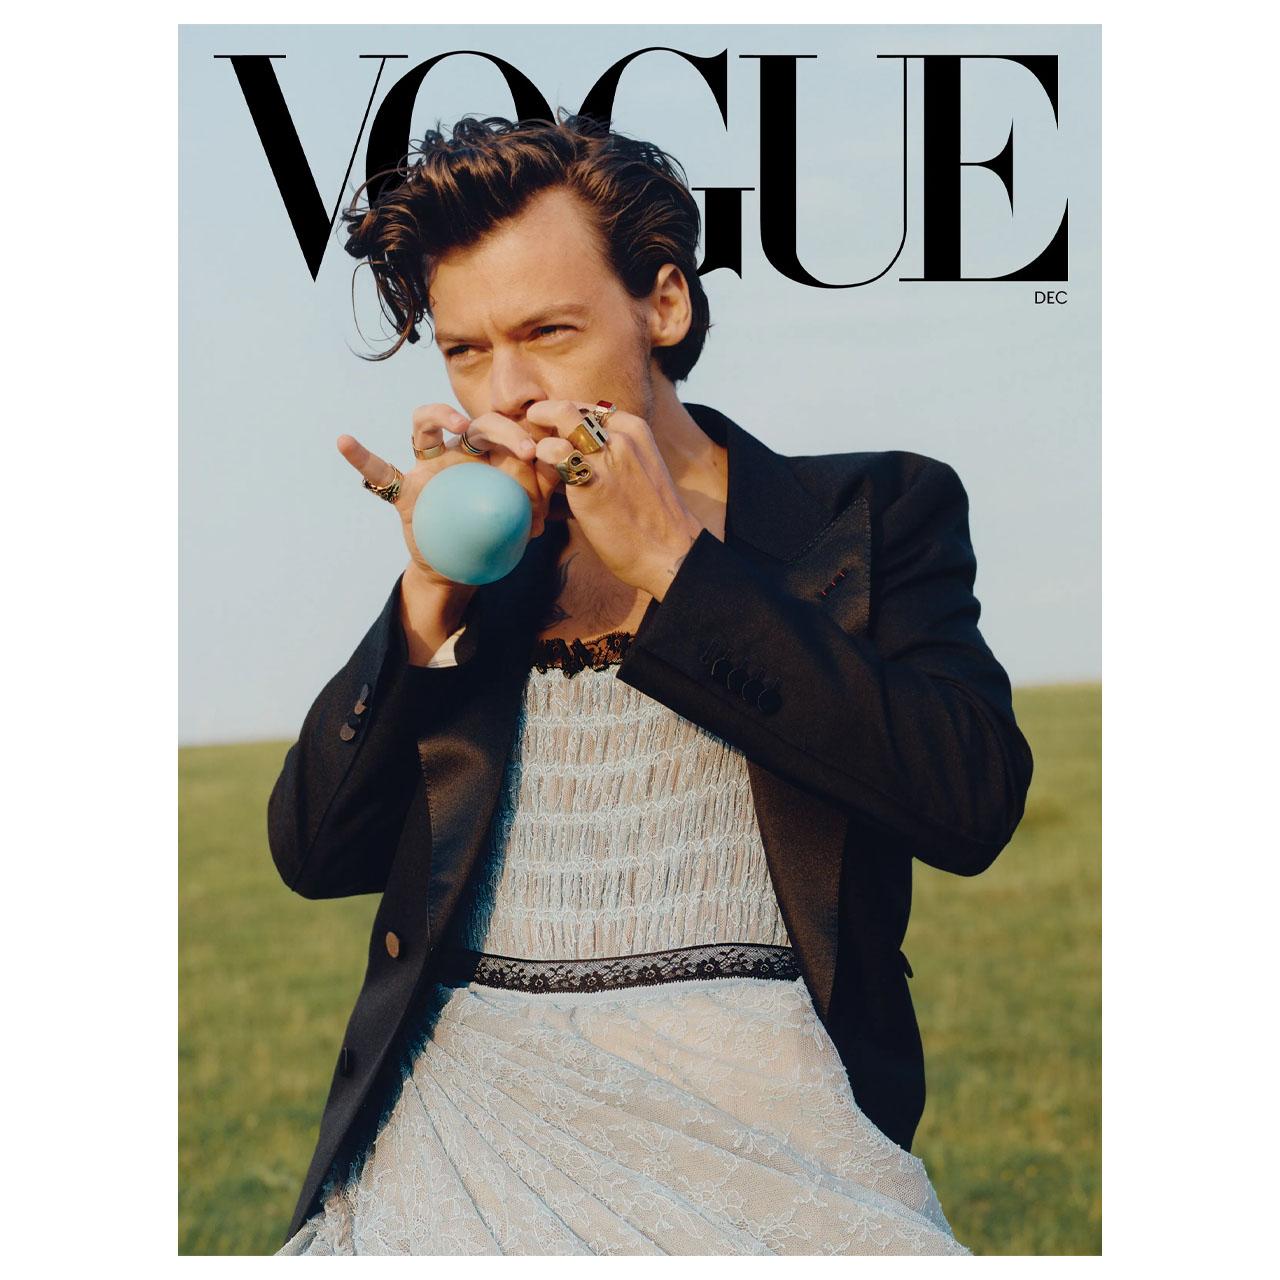 Harry Styles 2020 Vogue Magazine